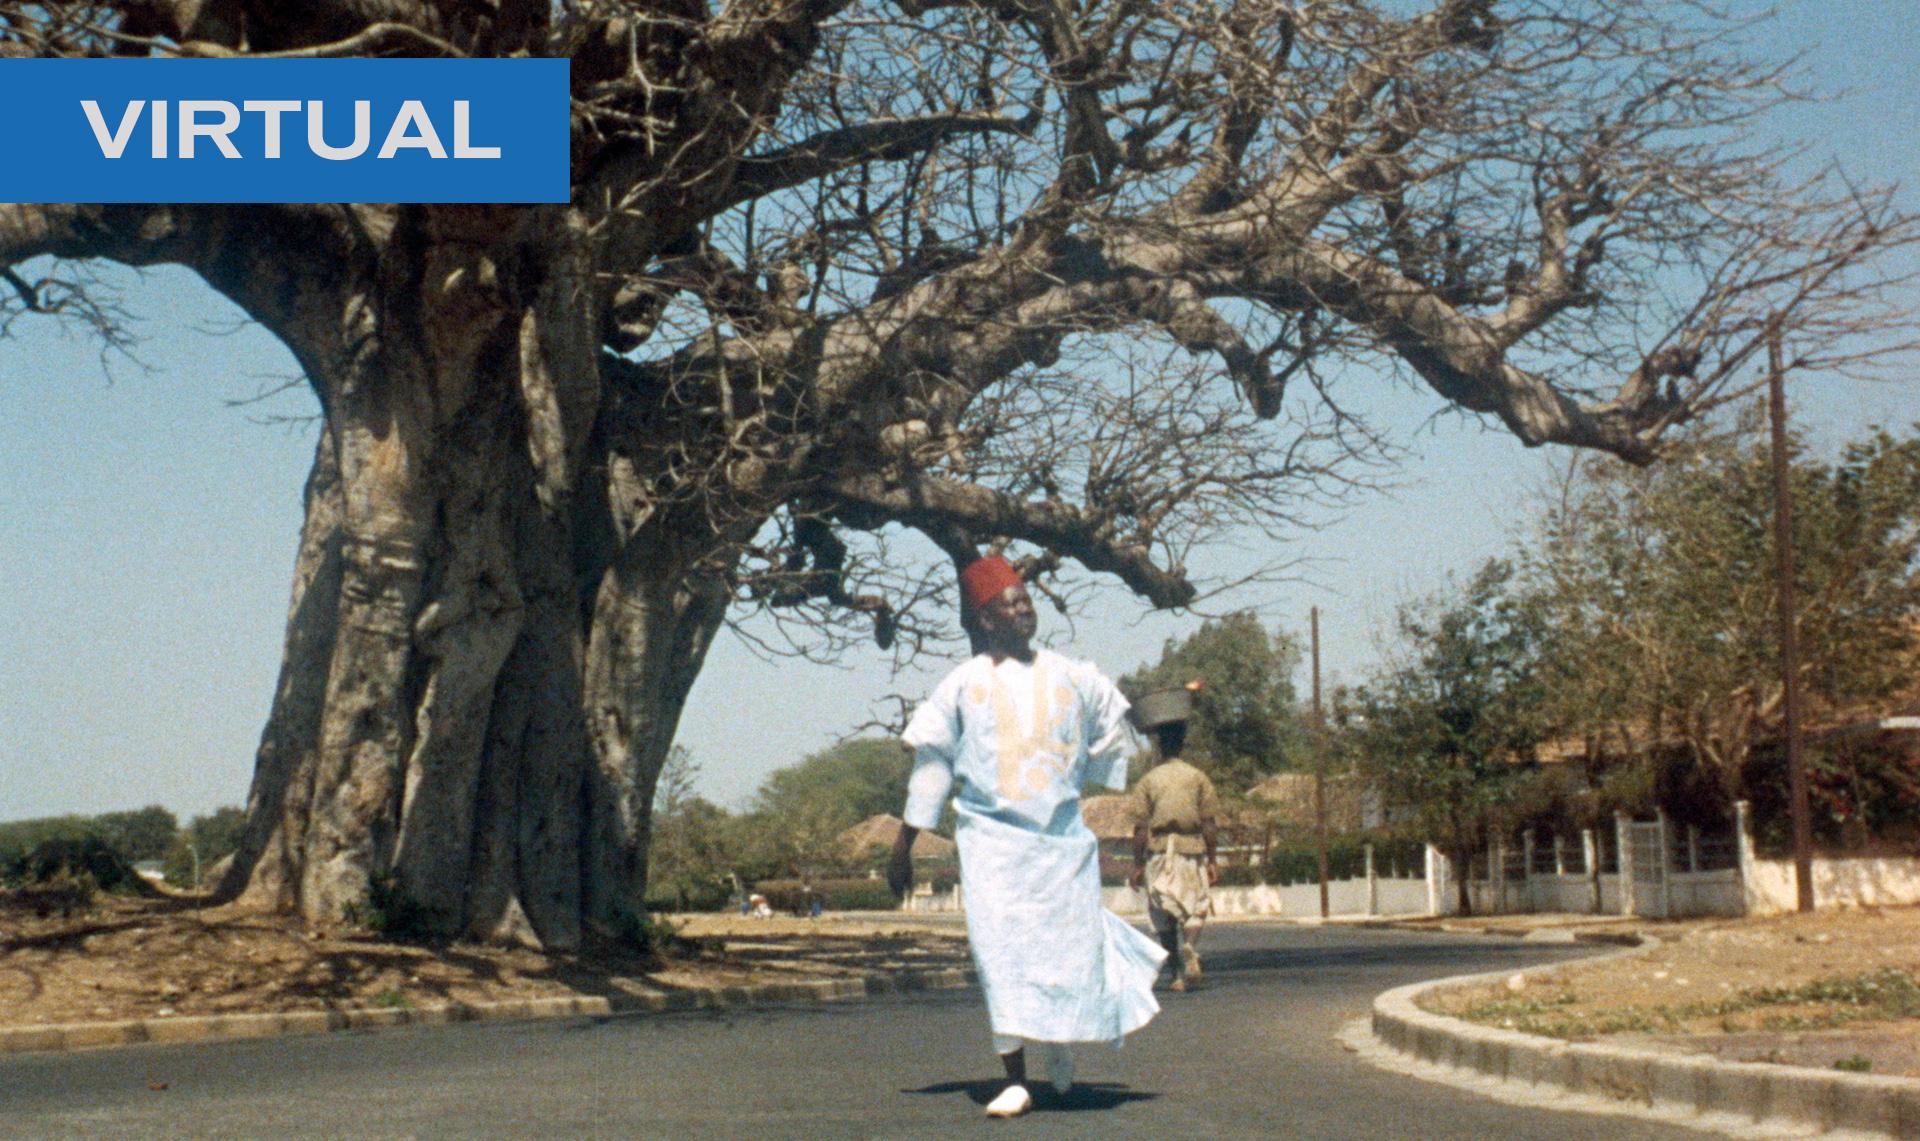 Virtual: MANDABI